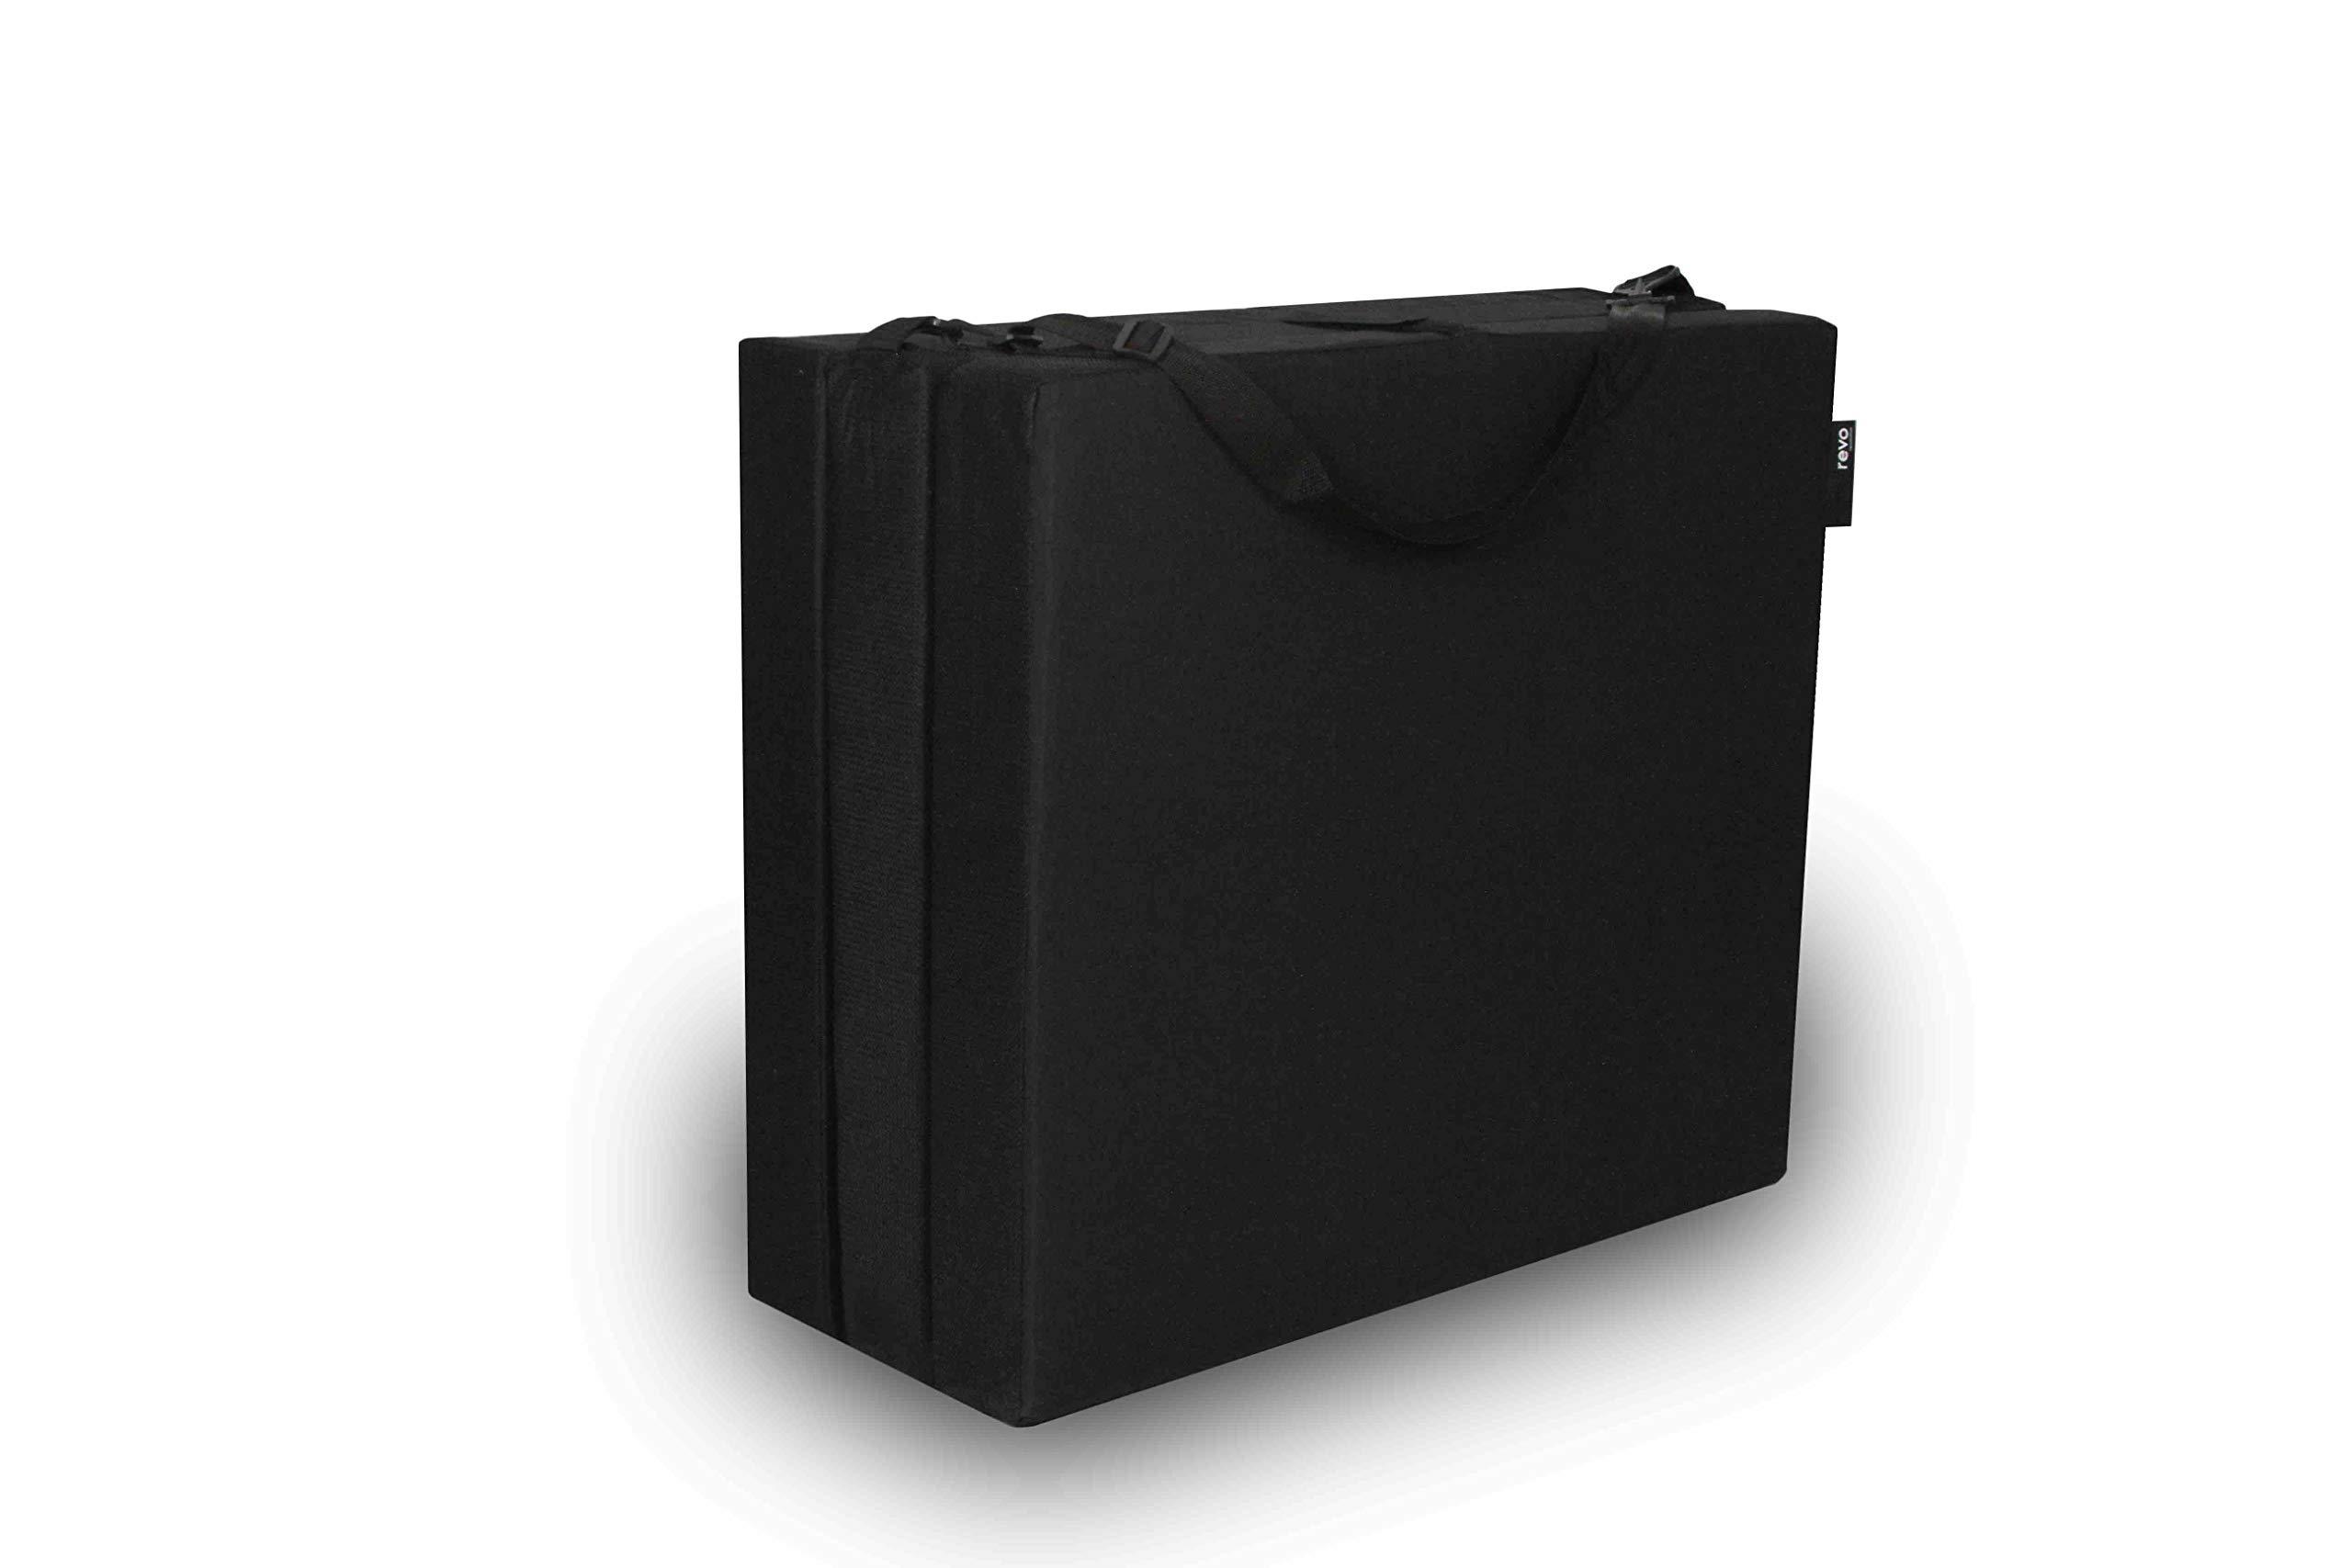 American Furniture Alliance 32-5723-601 Jr Twin Black Trifold Mattress, Mesh/Poly by American Furniture Alliance